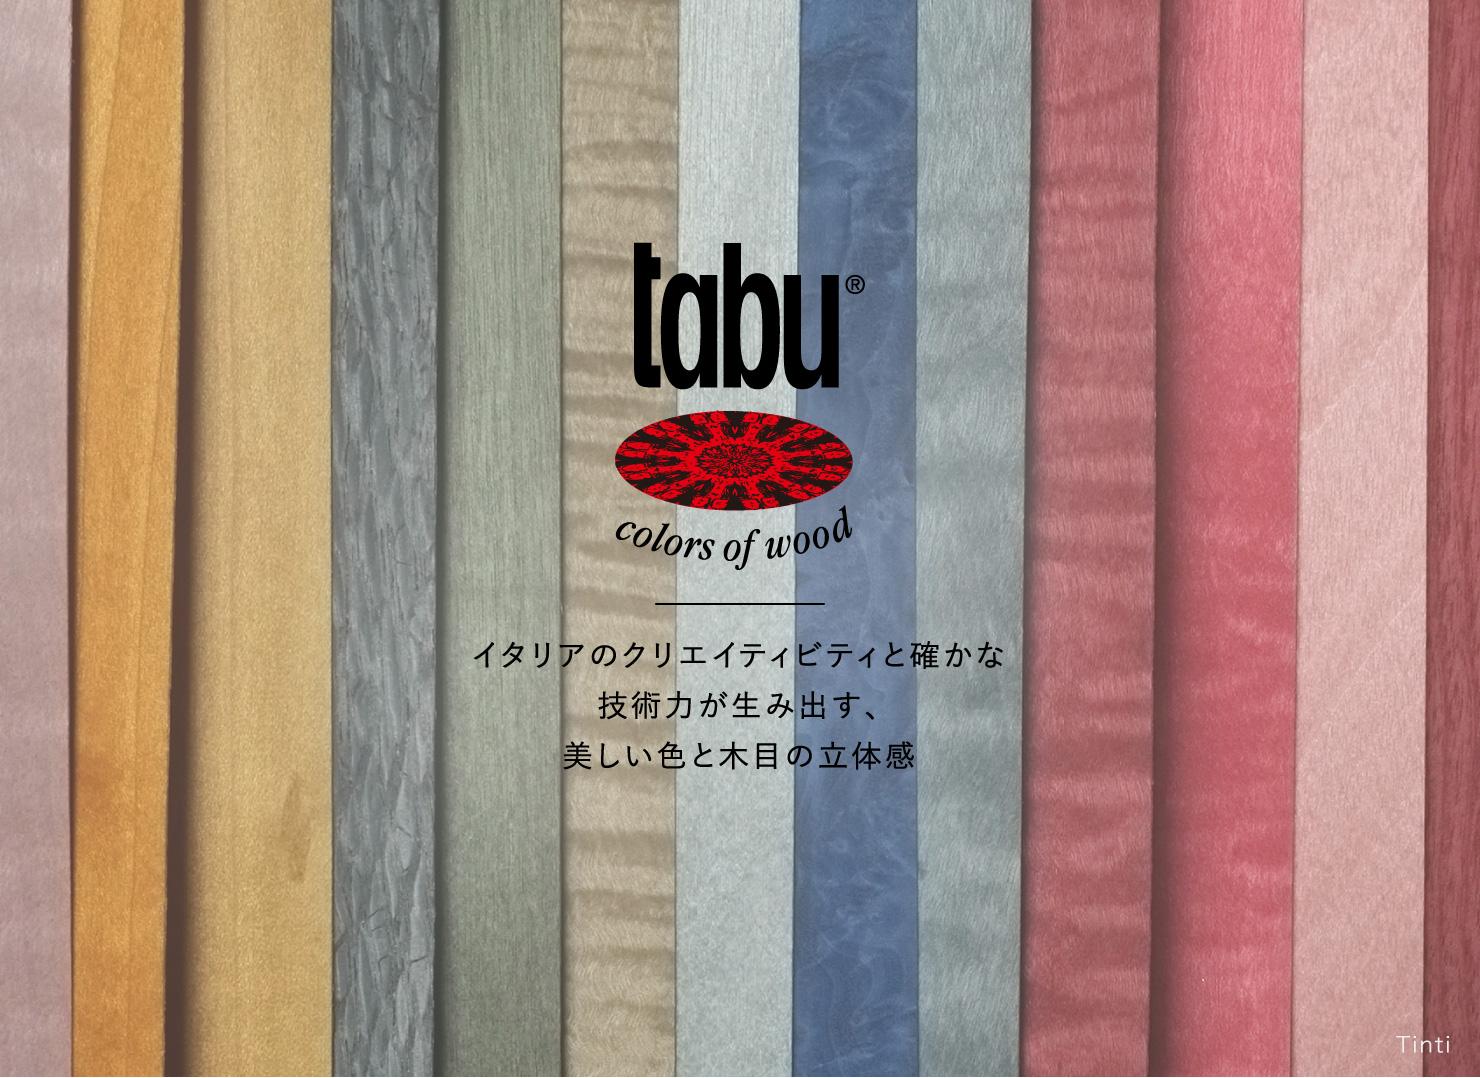 tabu colors of world イタリアのクリエイティビティと確かな技術力が生み出す、美しい色と木目の立体感 Tinti